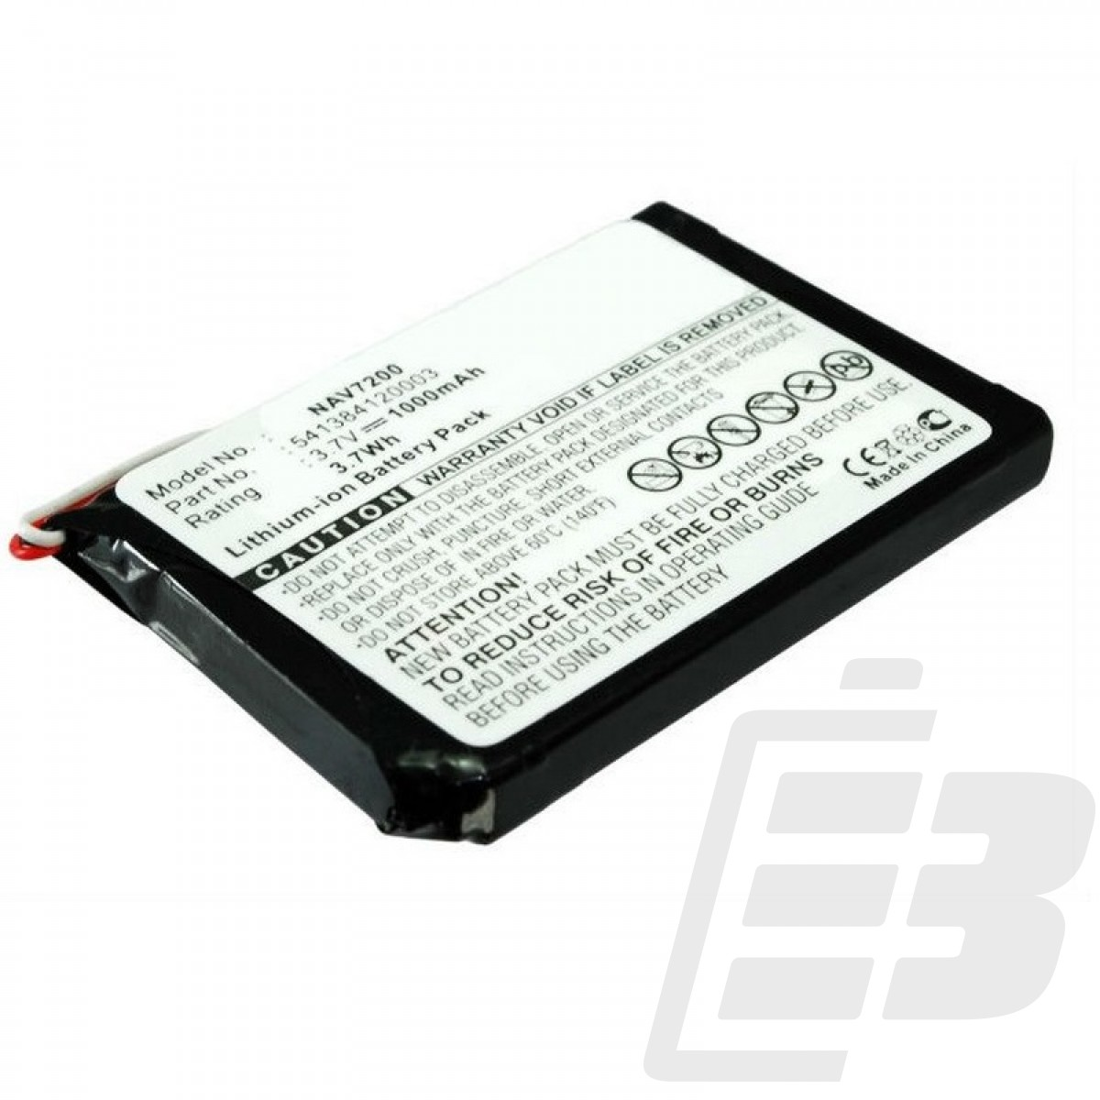 GPS battery Navigon 72 Plus Live_1